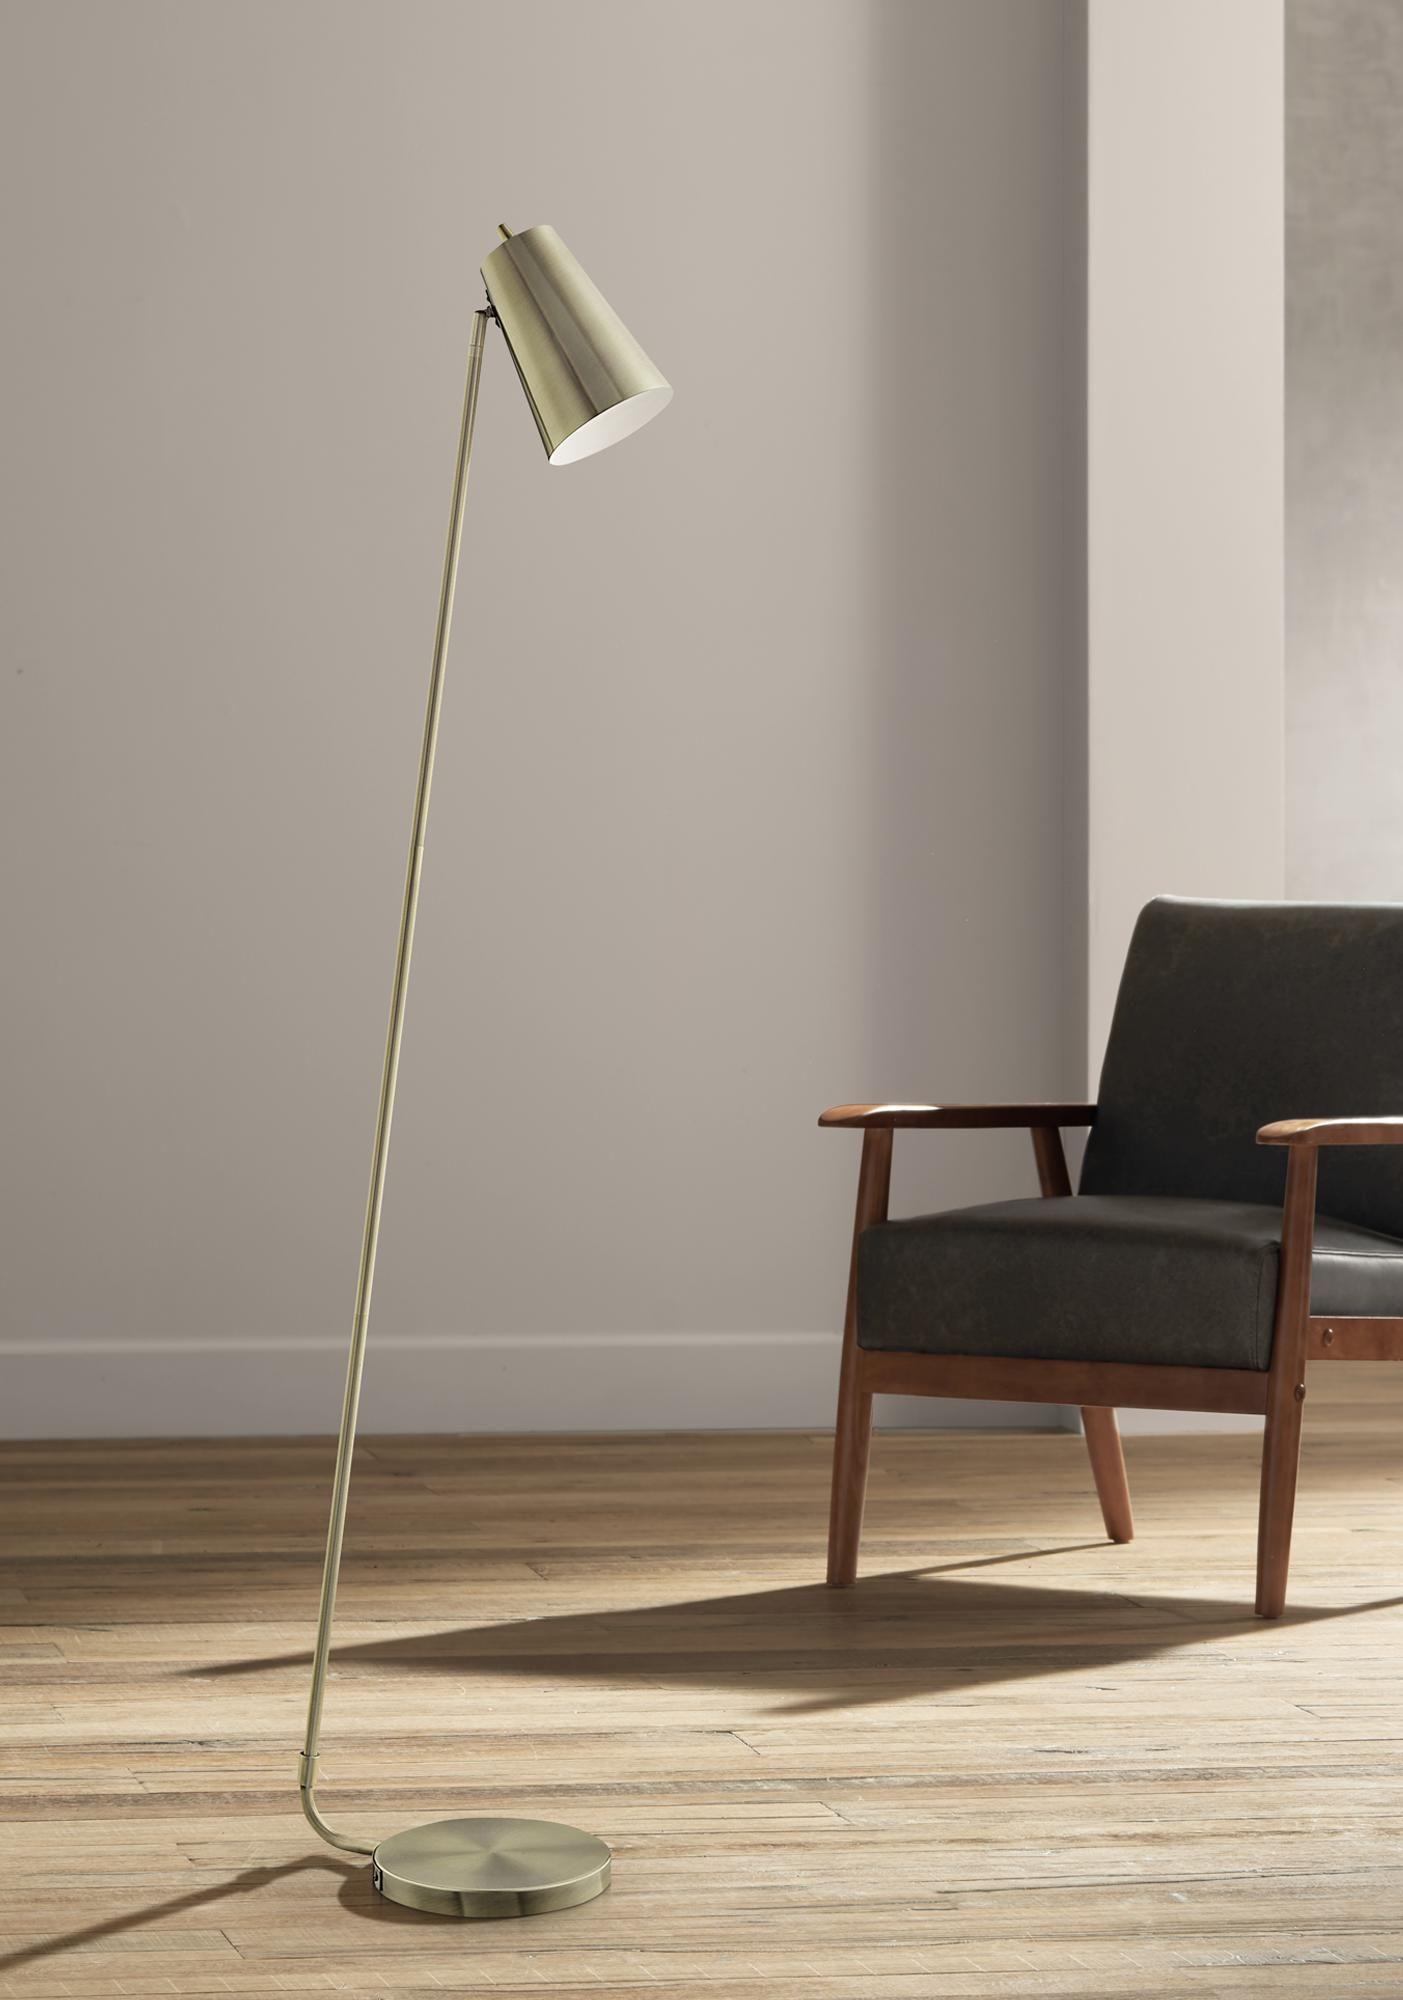 Floor Lamps Lite Source Mccoy 62 1 2 High Antique Brass Floor Lamp In 2020 Antique Brass Floor Lamp Brass Floor Lamp Floor Lamp